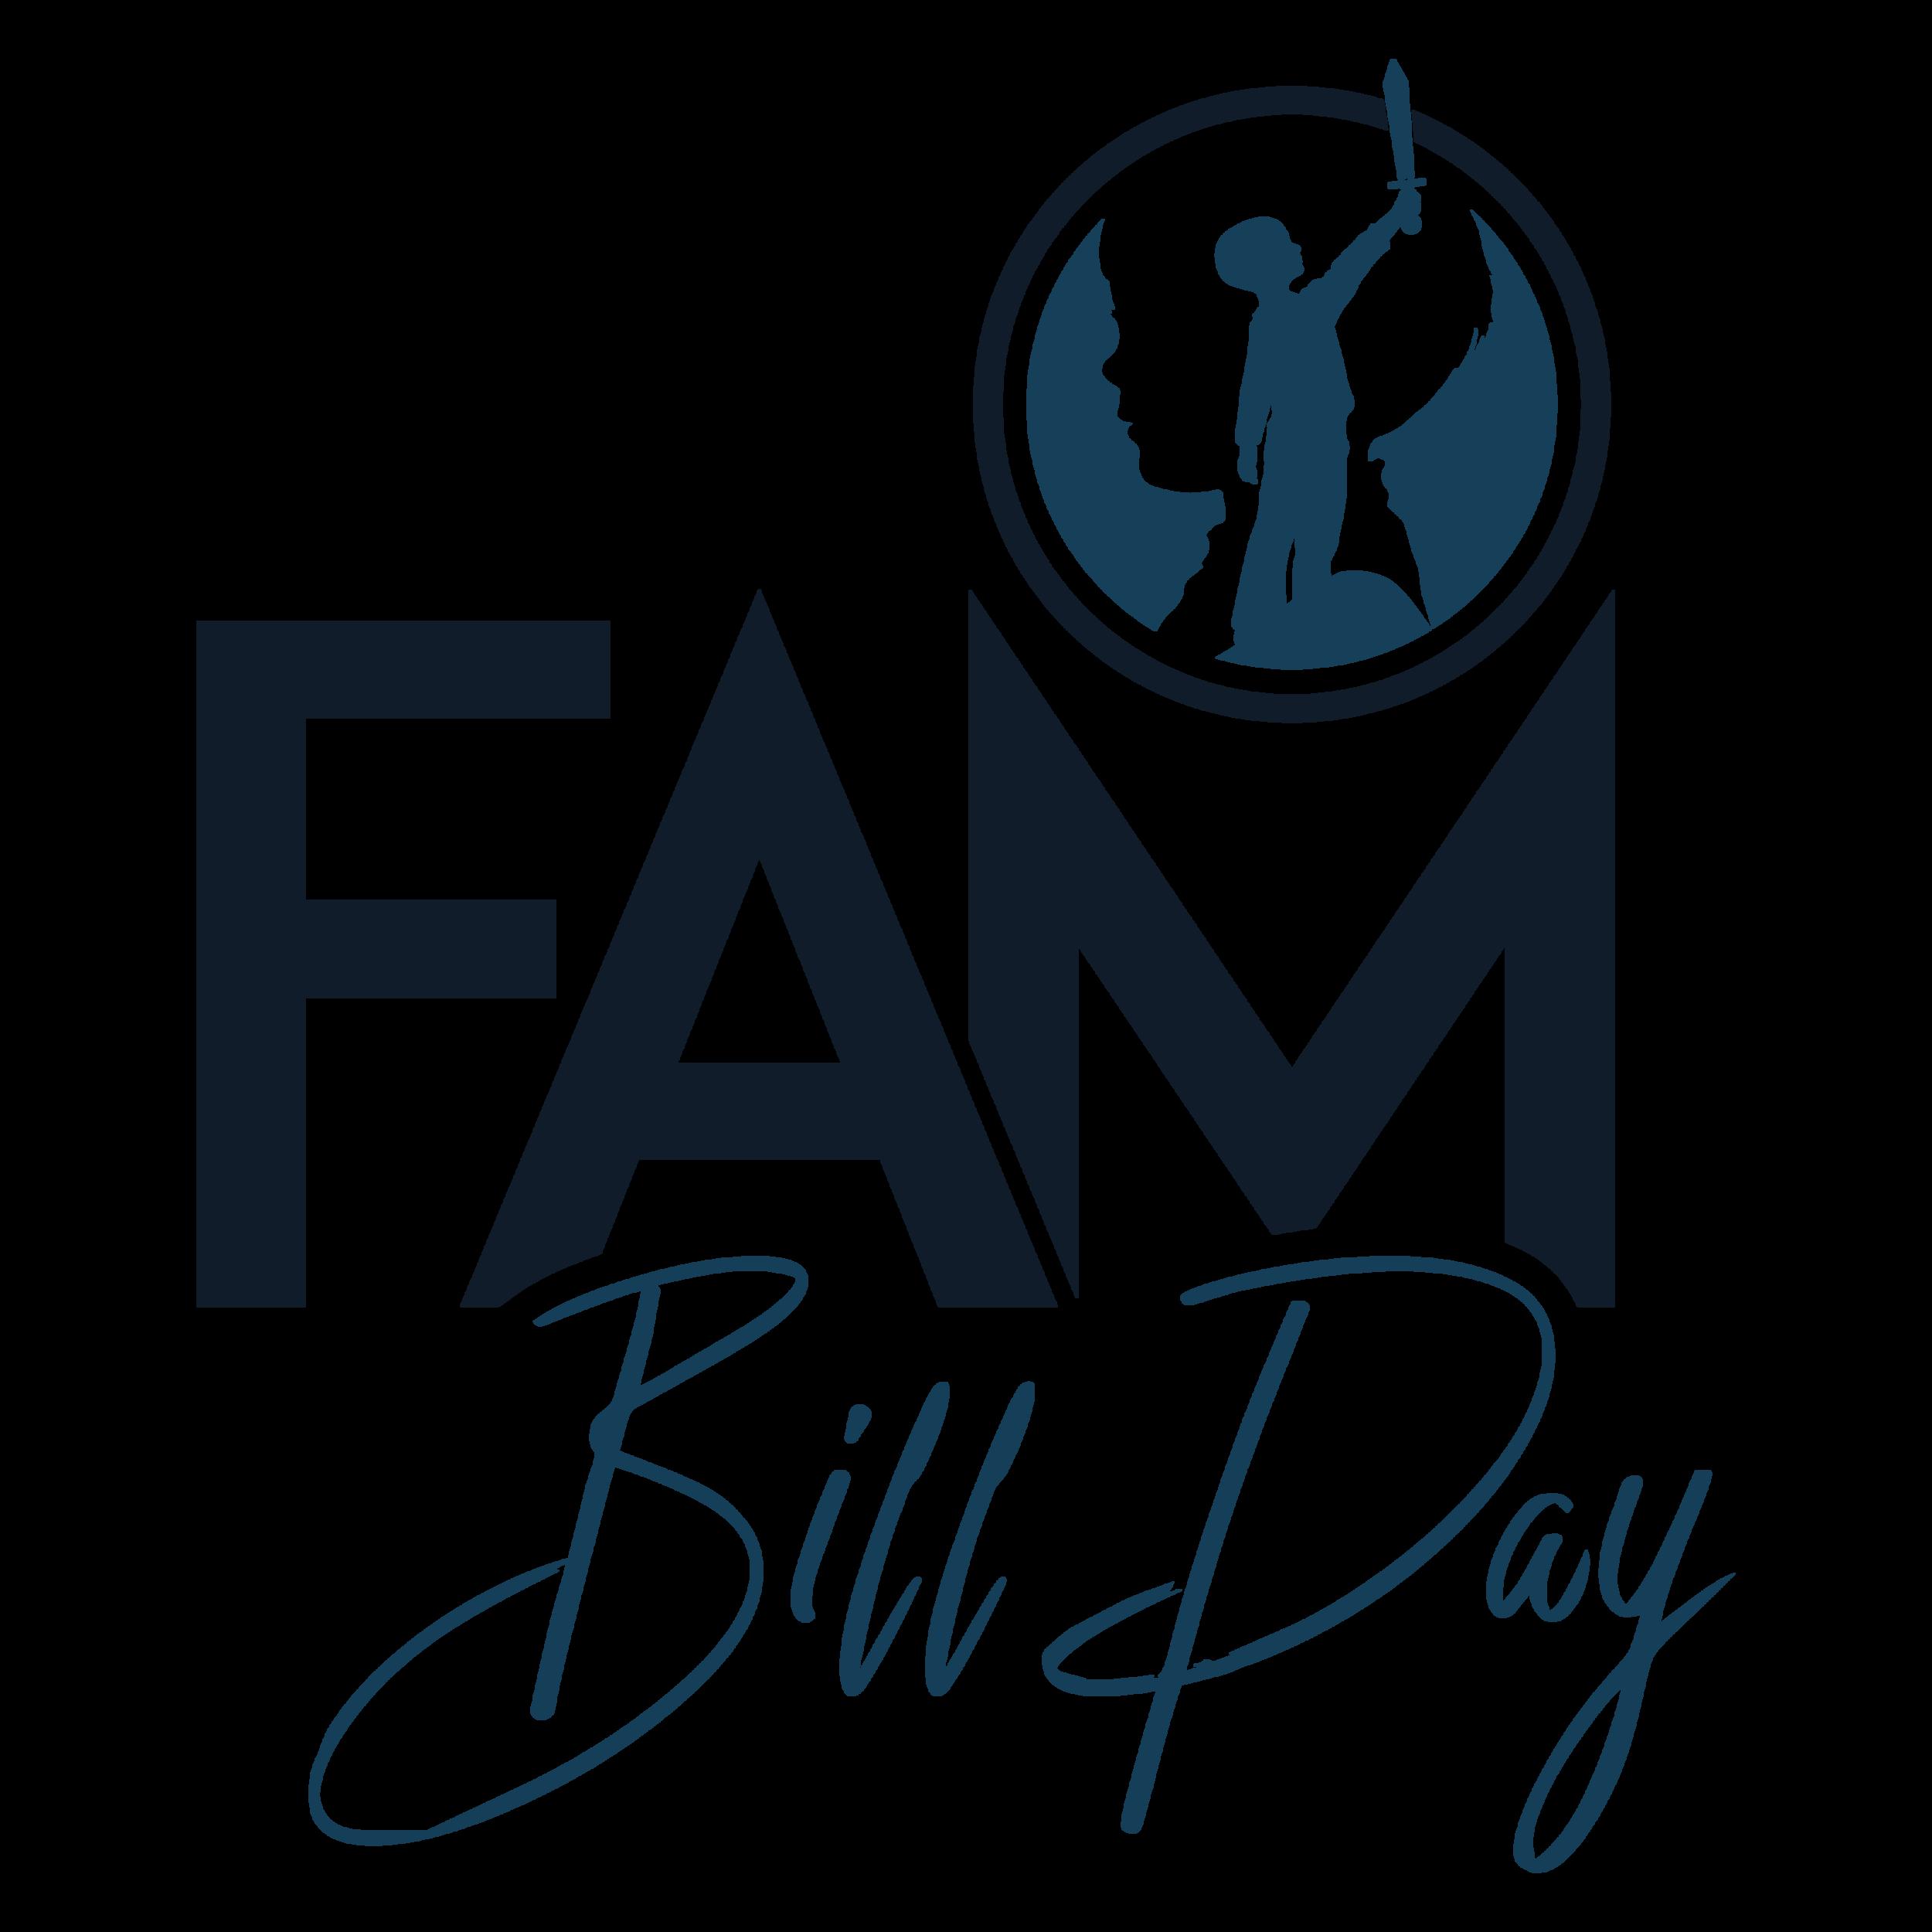 FAM_SERVICE_Logos_2019-01.png